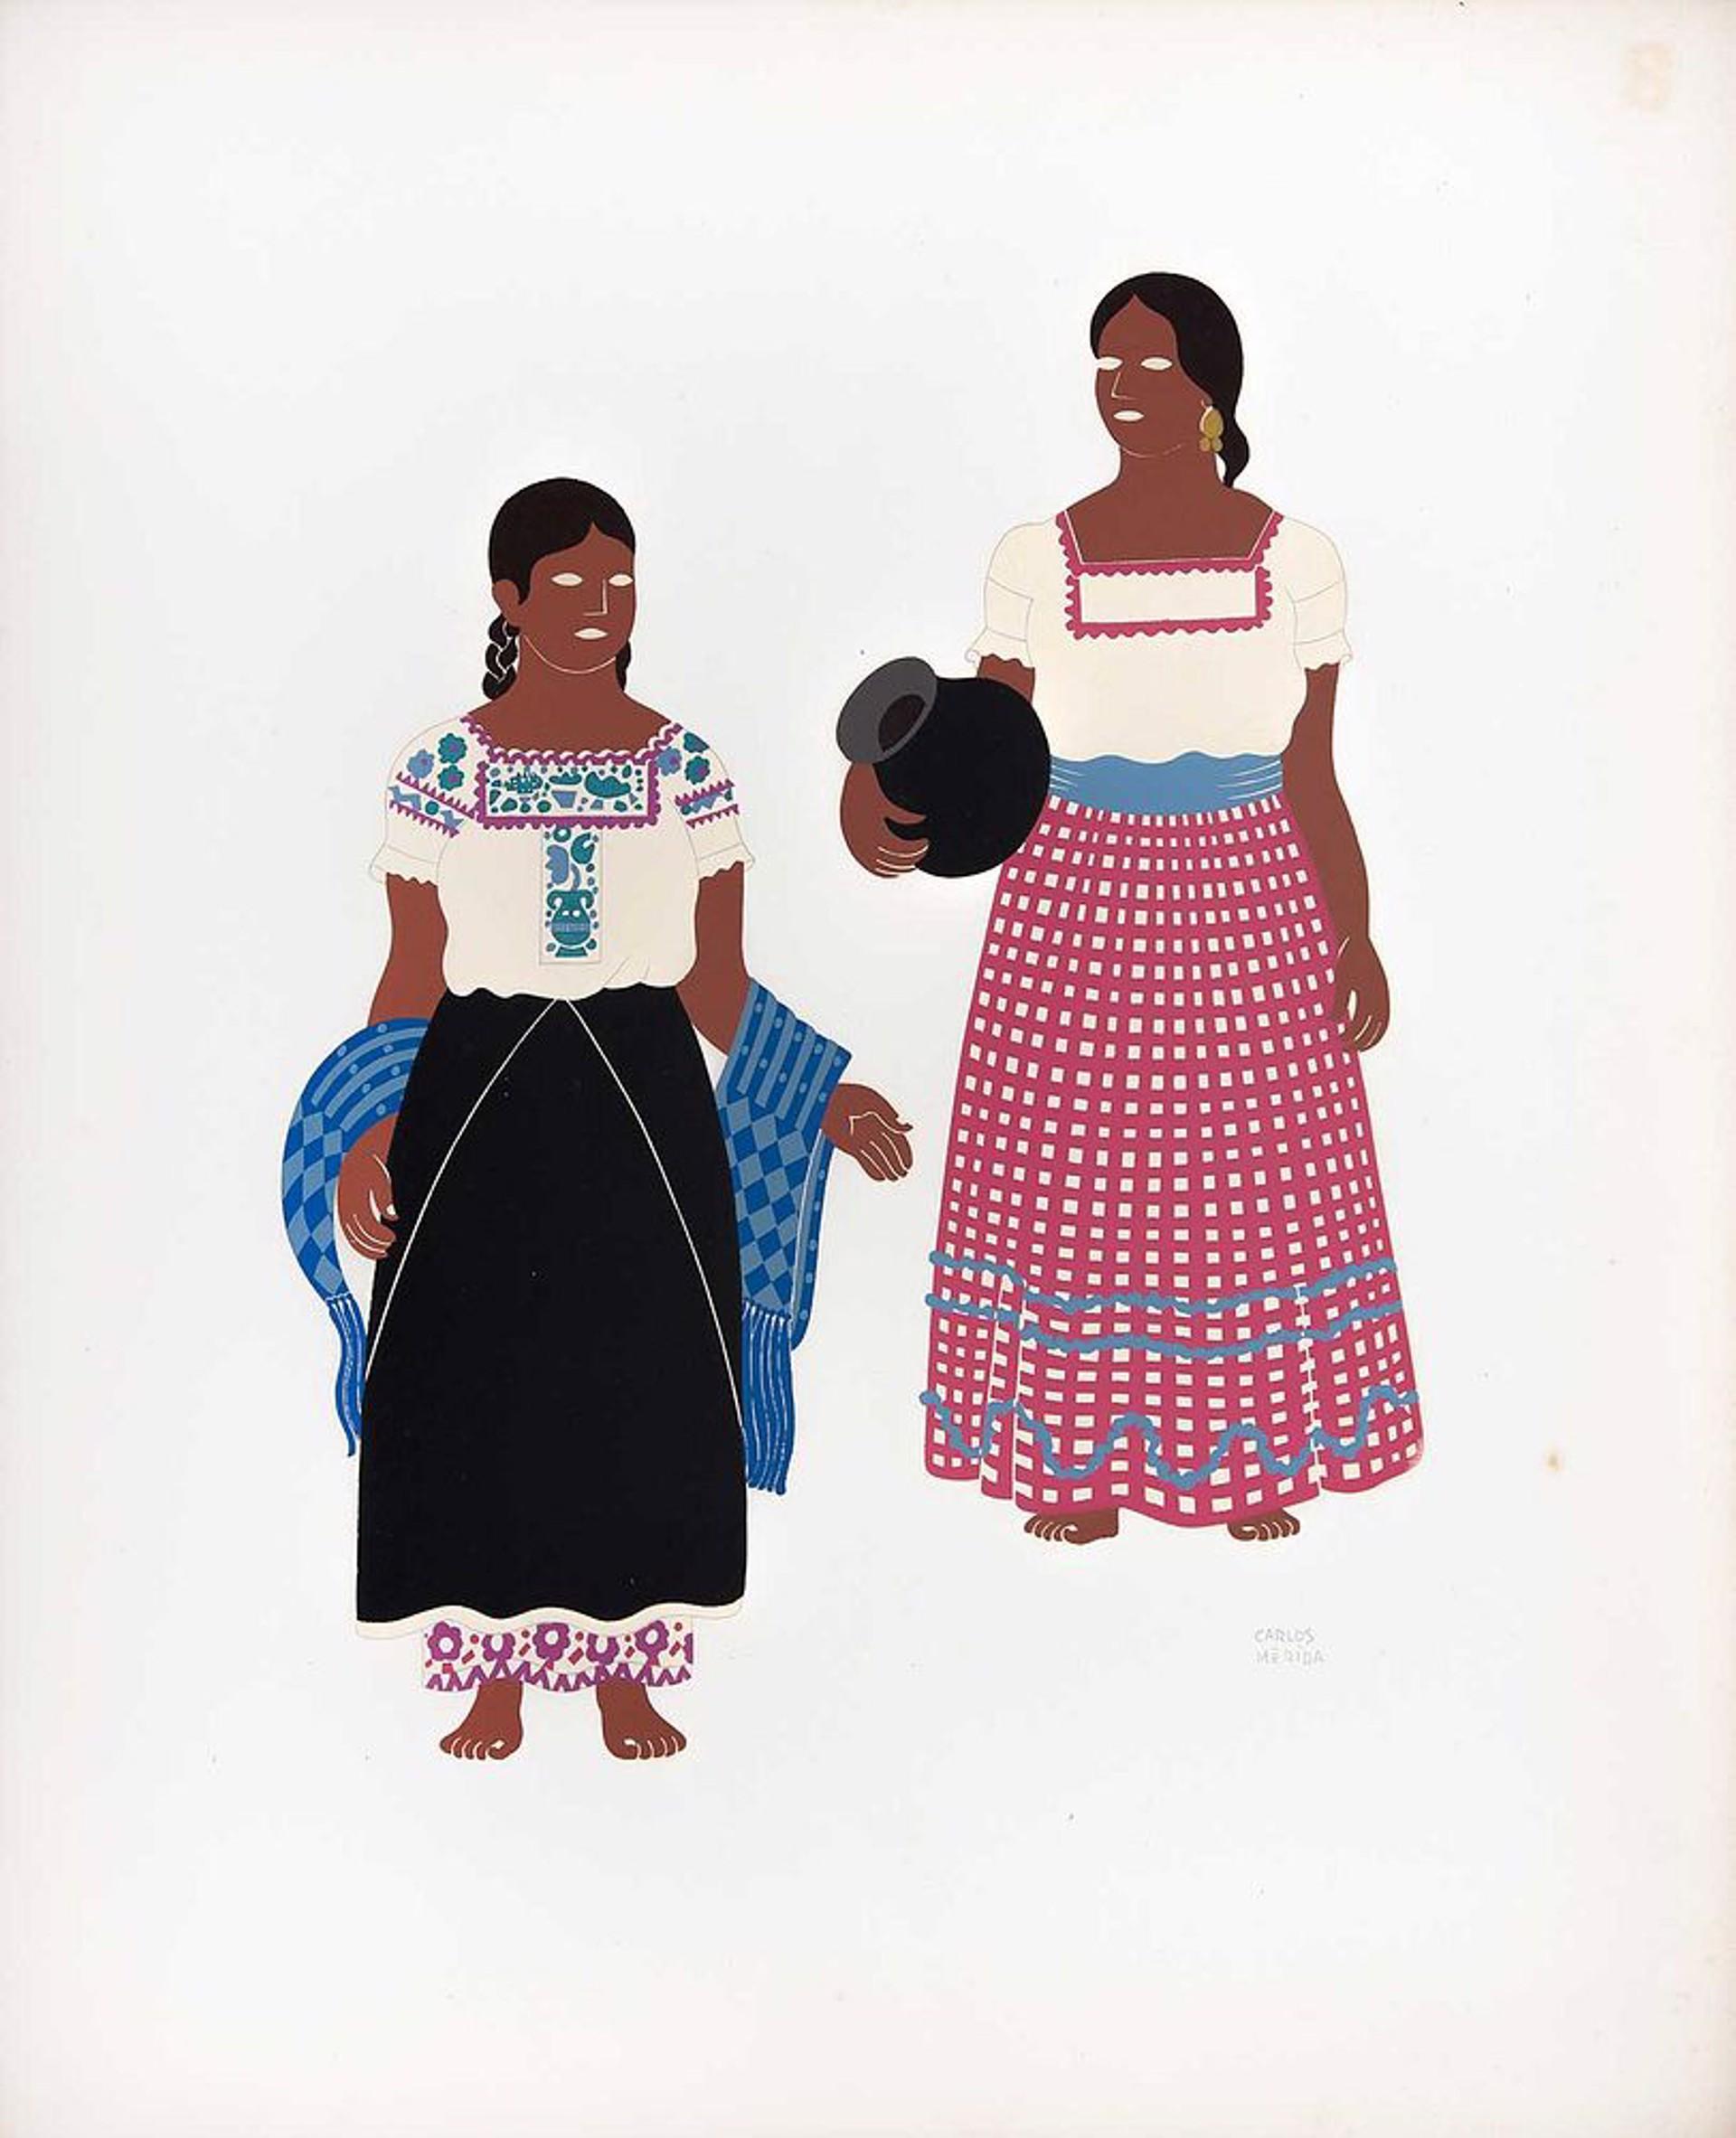 Toltecs of the State of Puebla by Carlos Mérida (1891 - 1985)